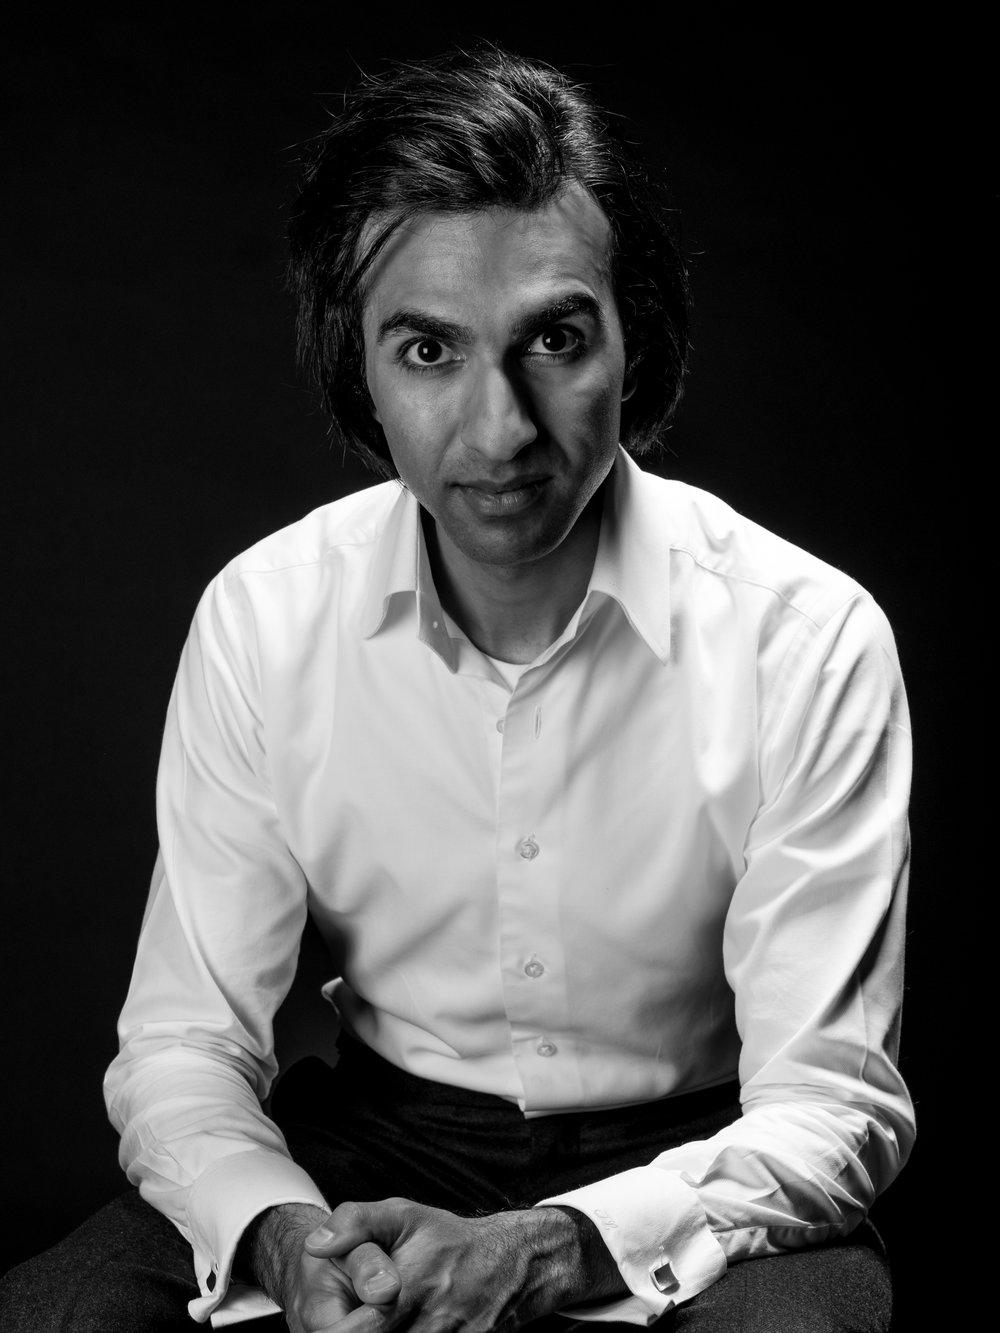 JAMEEL LALANI - ENTREPENEUR